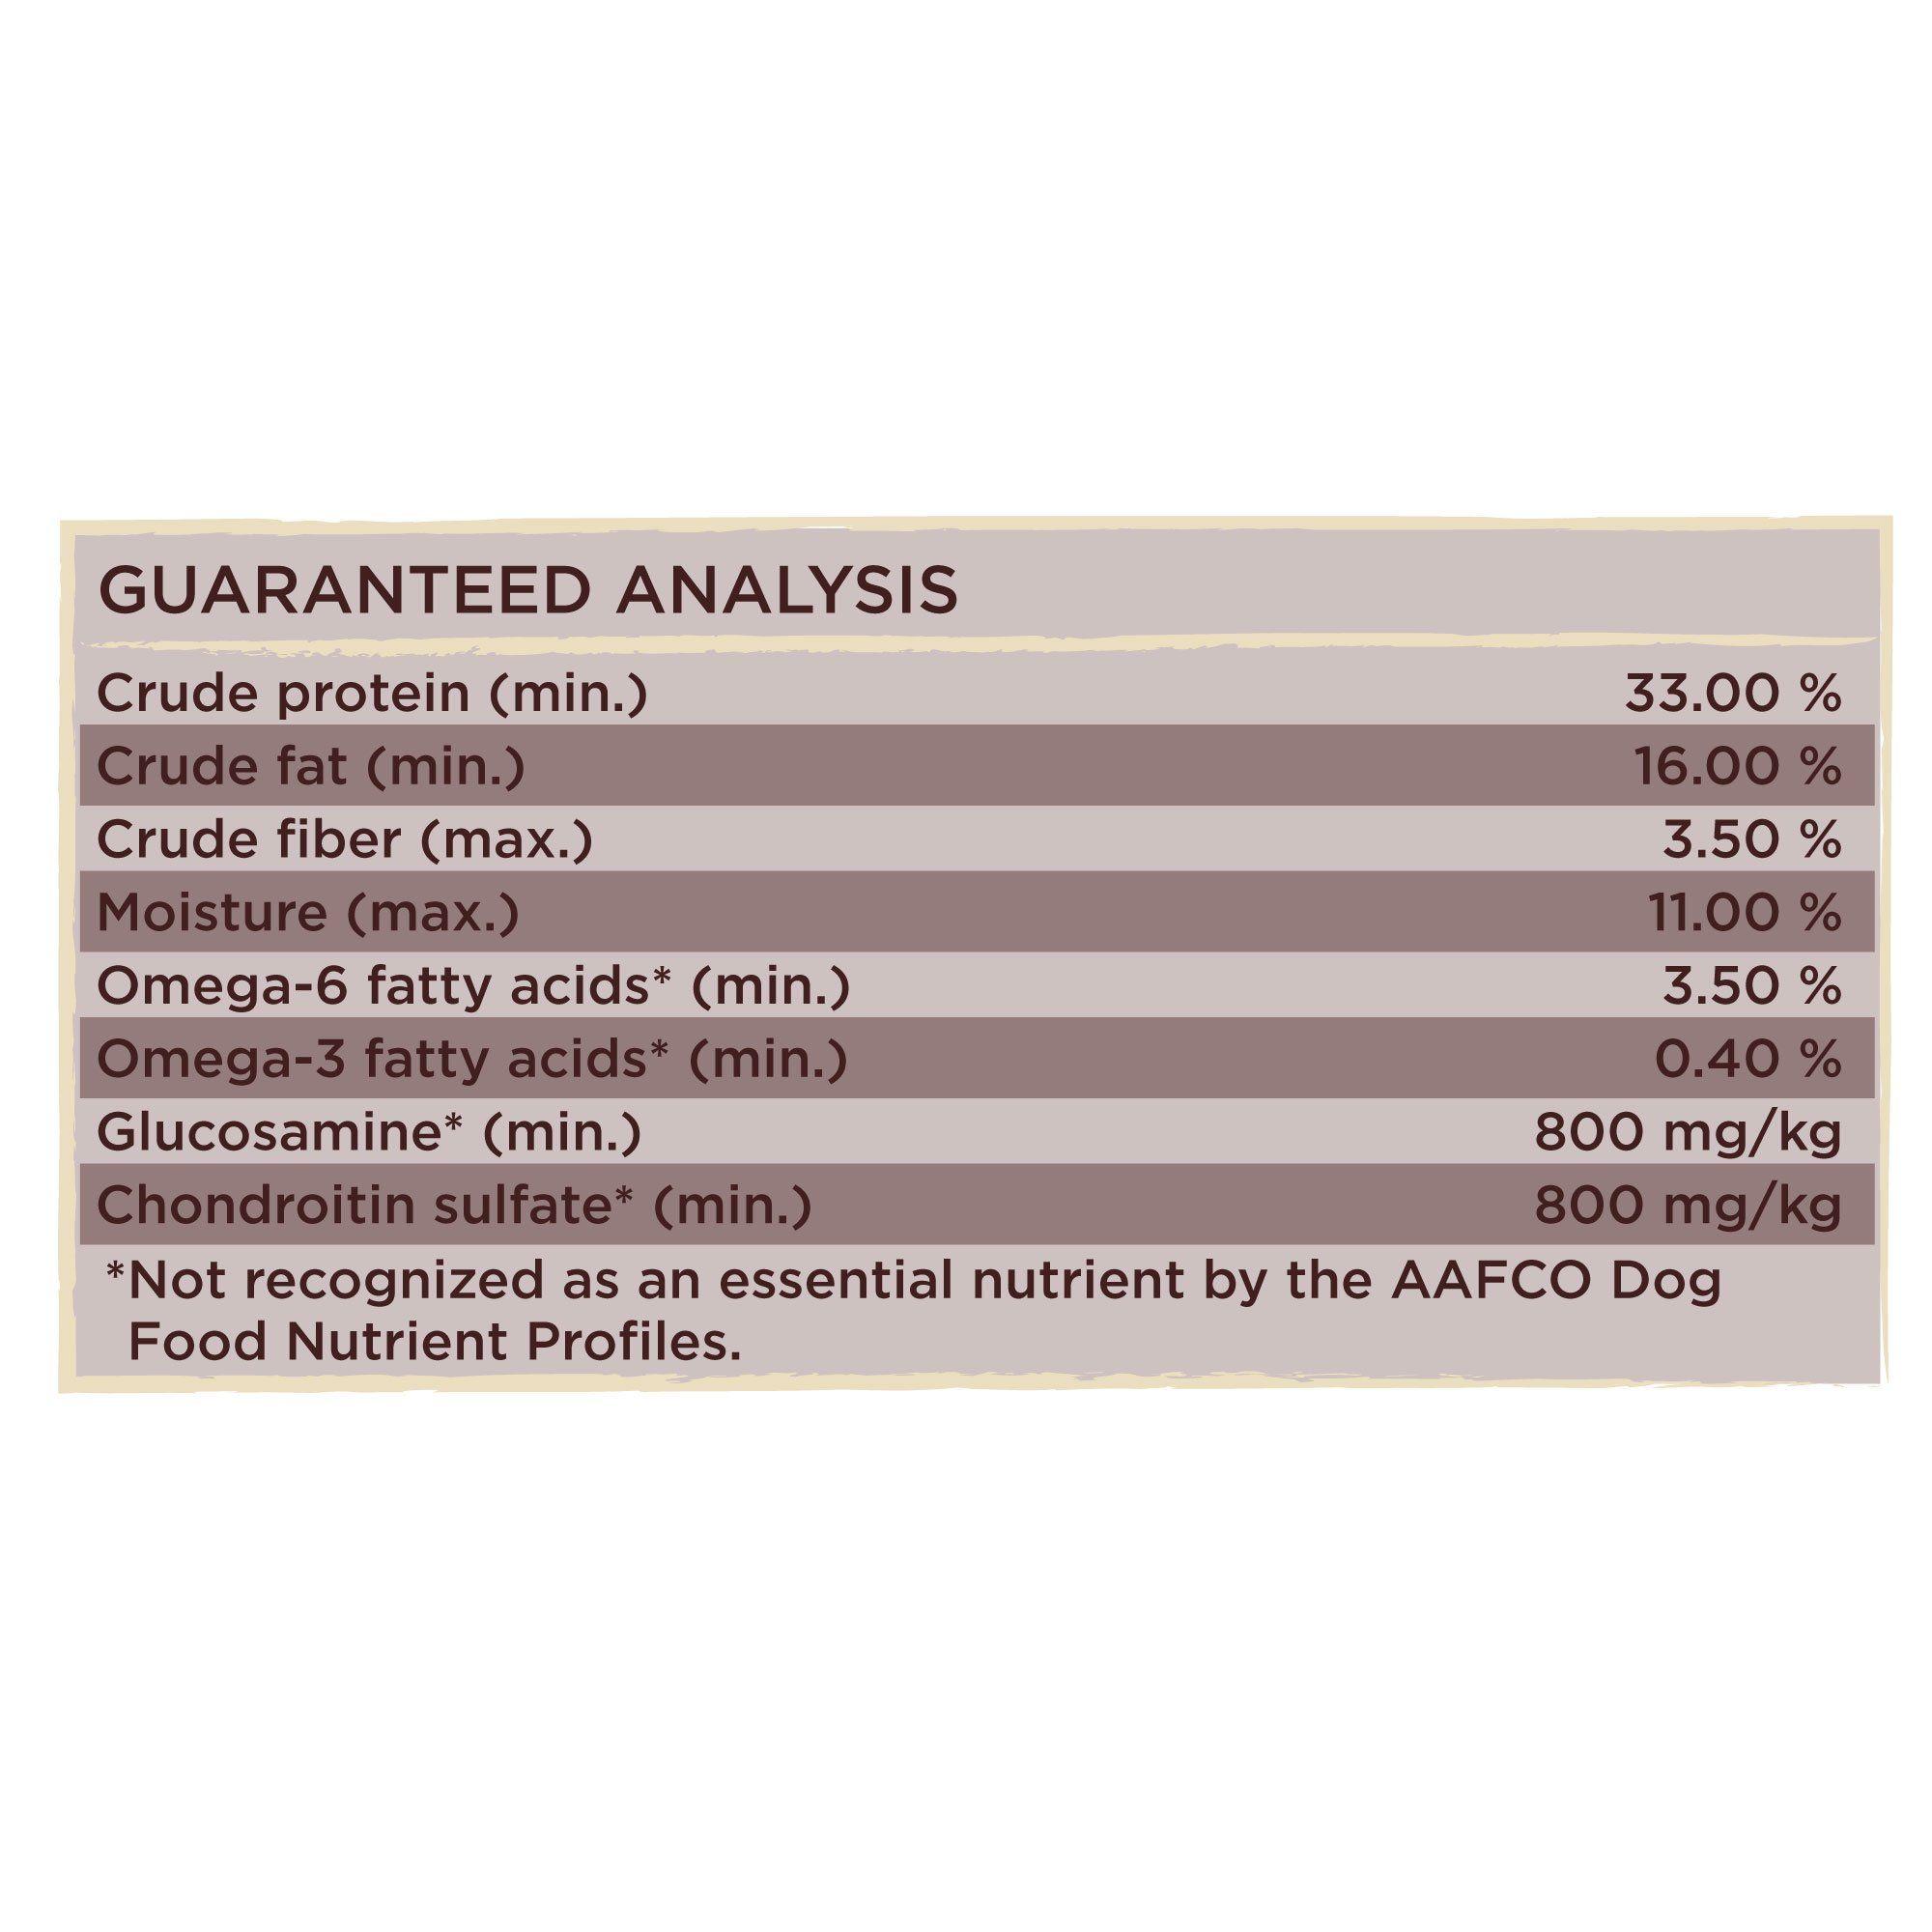 Kirkland Dog Food Review Ingredients Analysis Dog Food Recipes